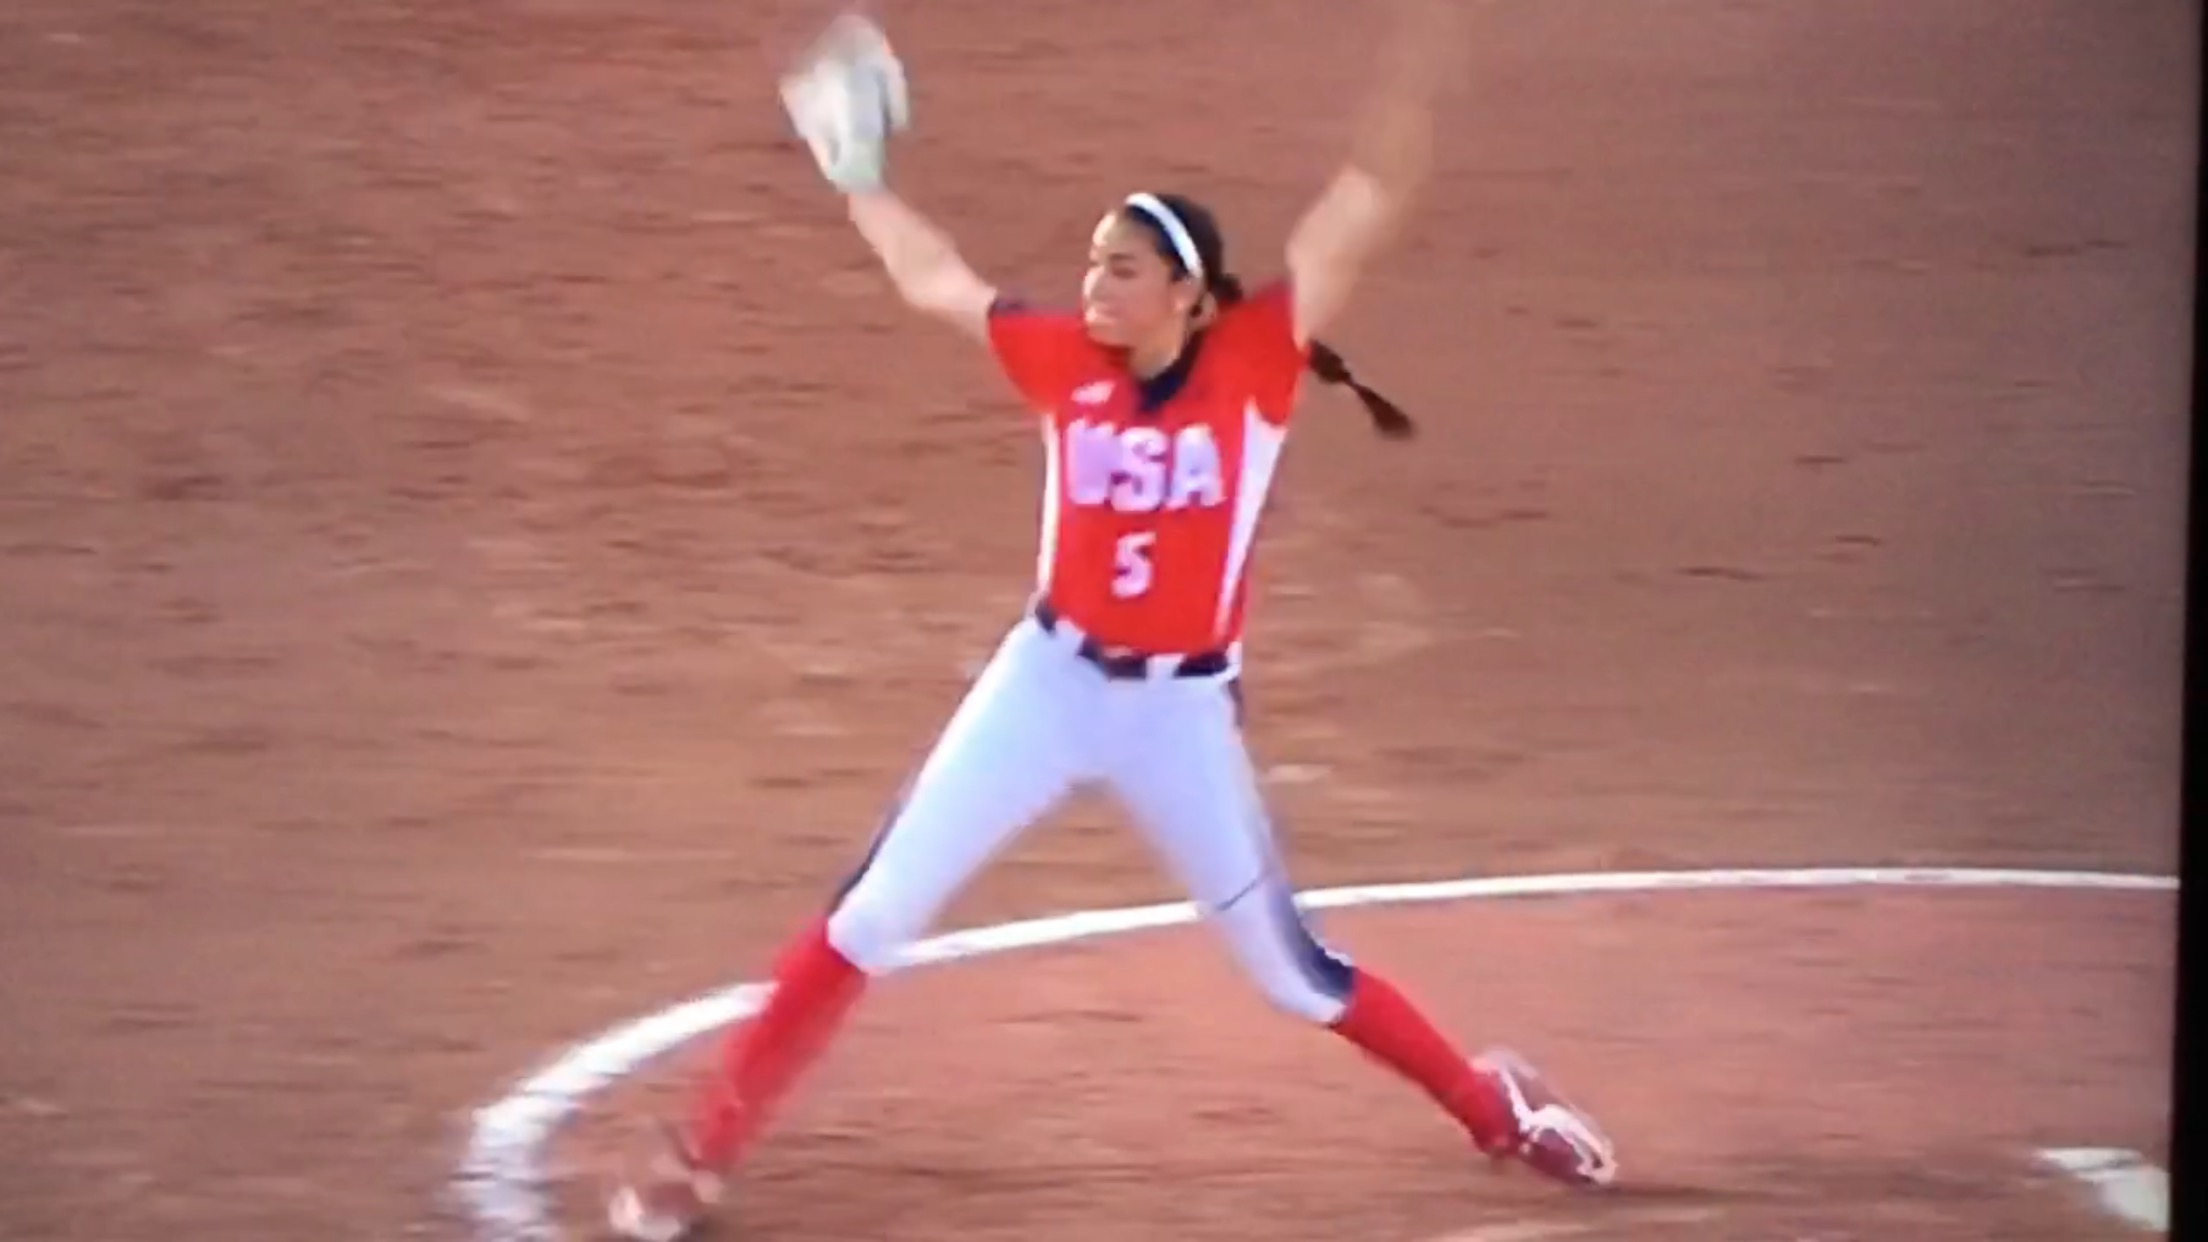 Danielle O'Toole, softball pitcher for USA